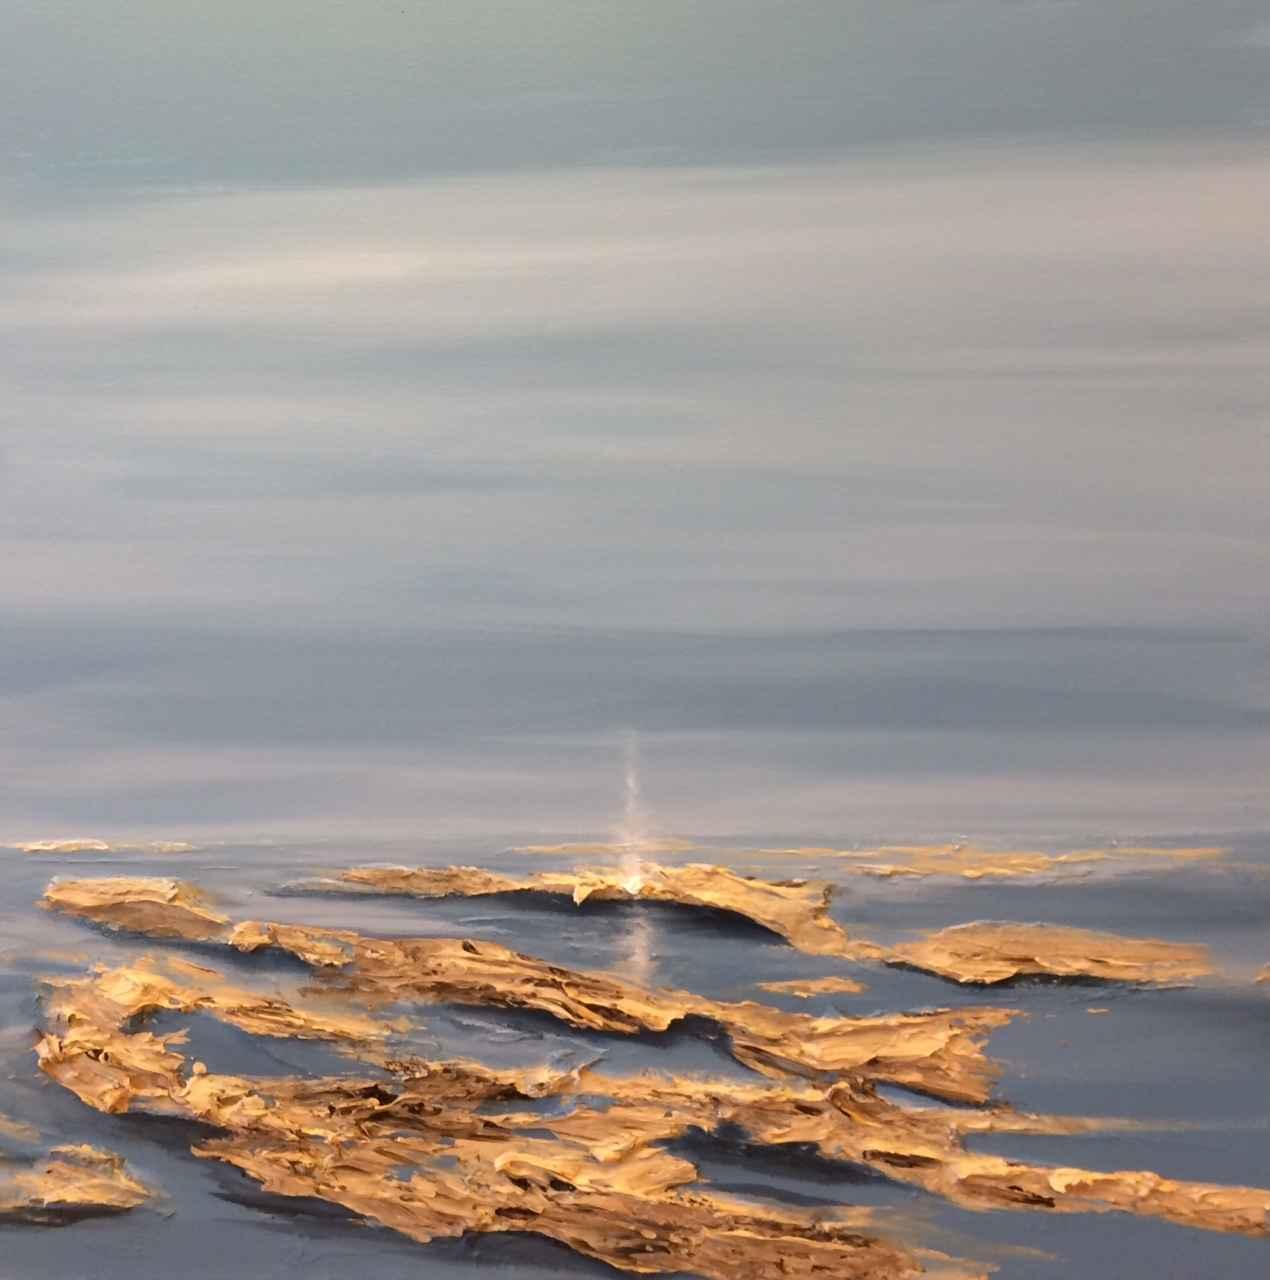 Seaside Melody #1 by  Steve Lyons - Masterpiece Online